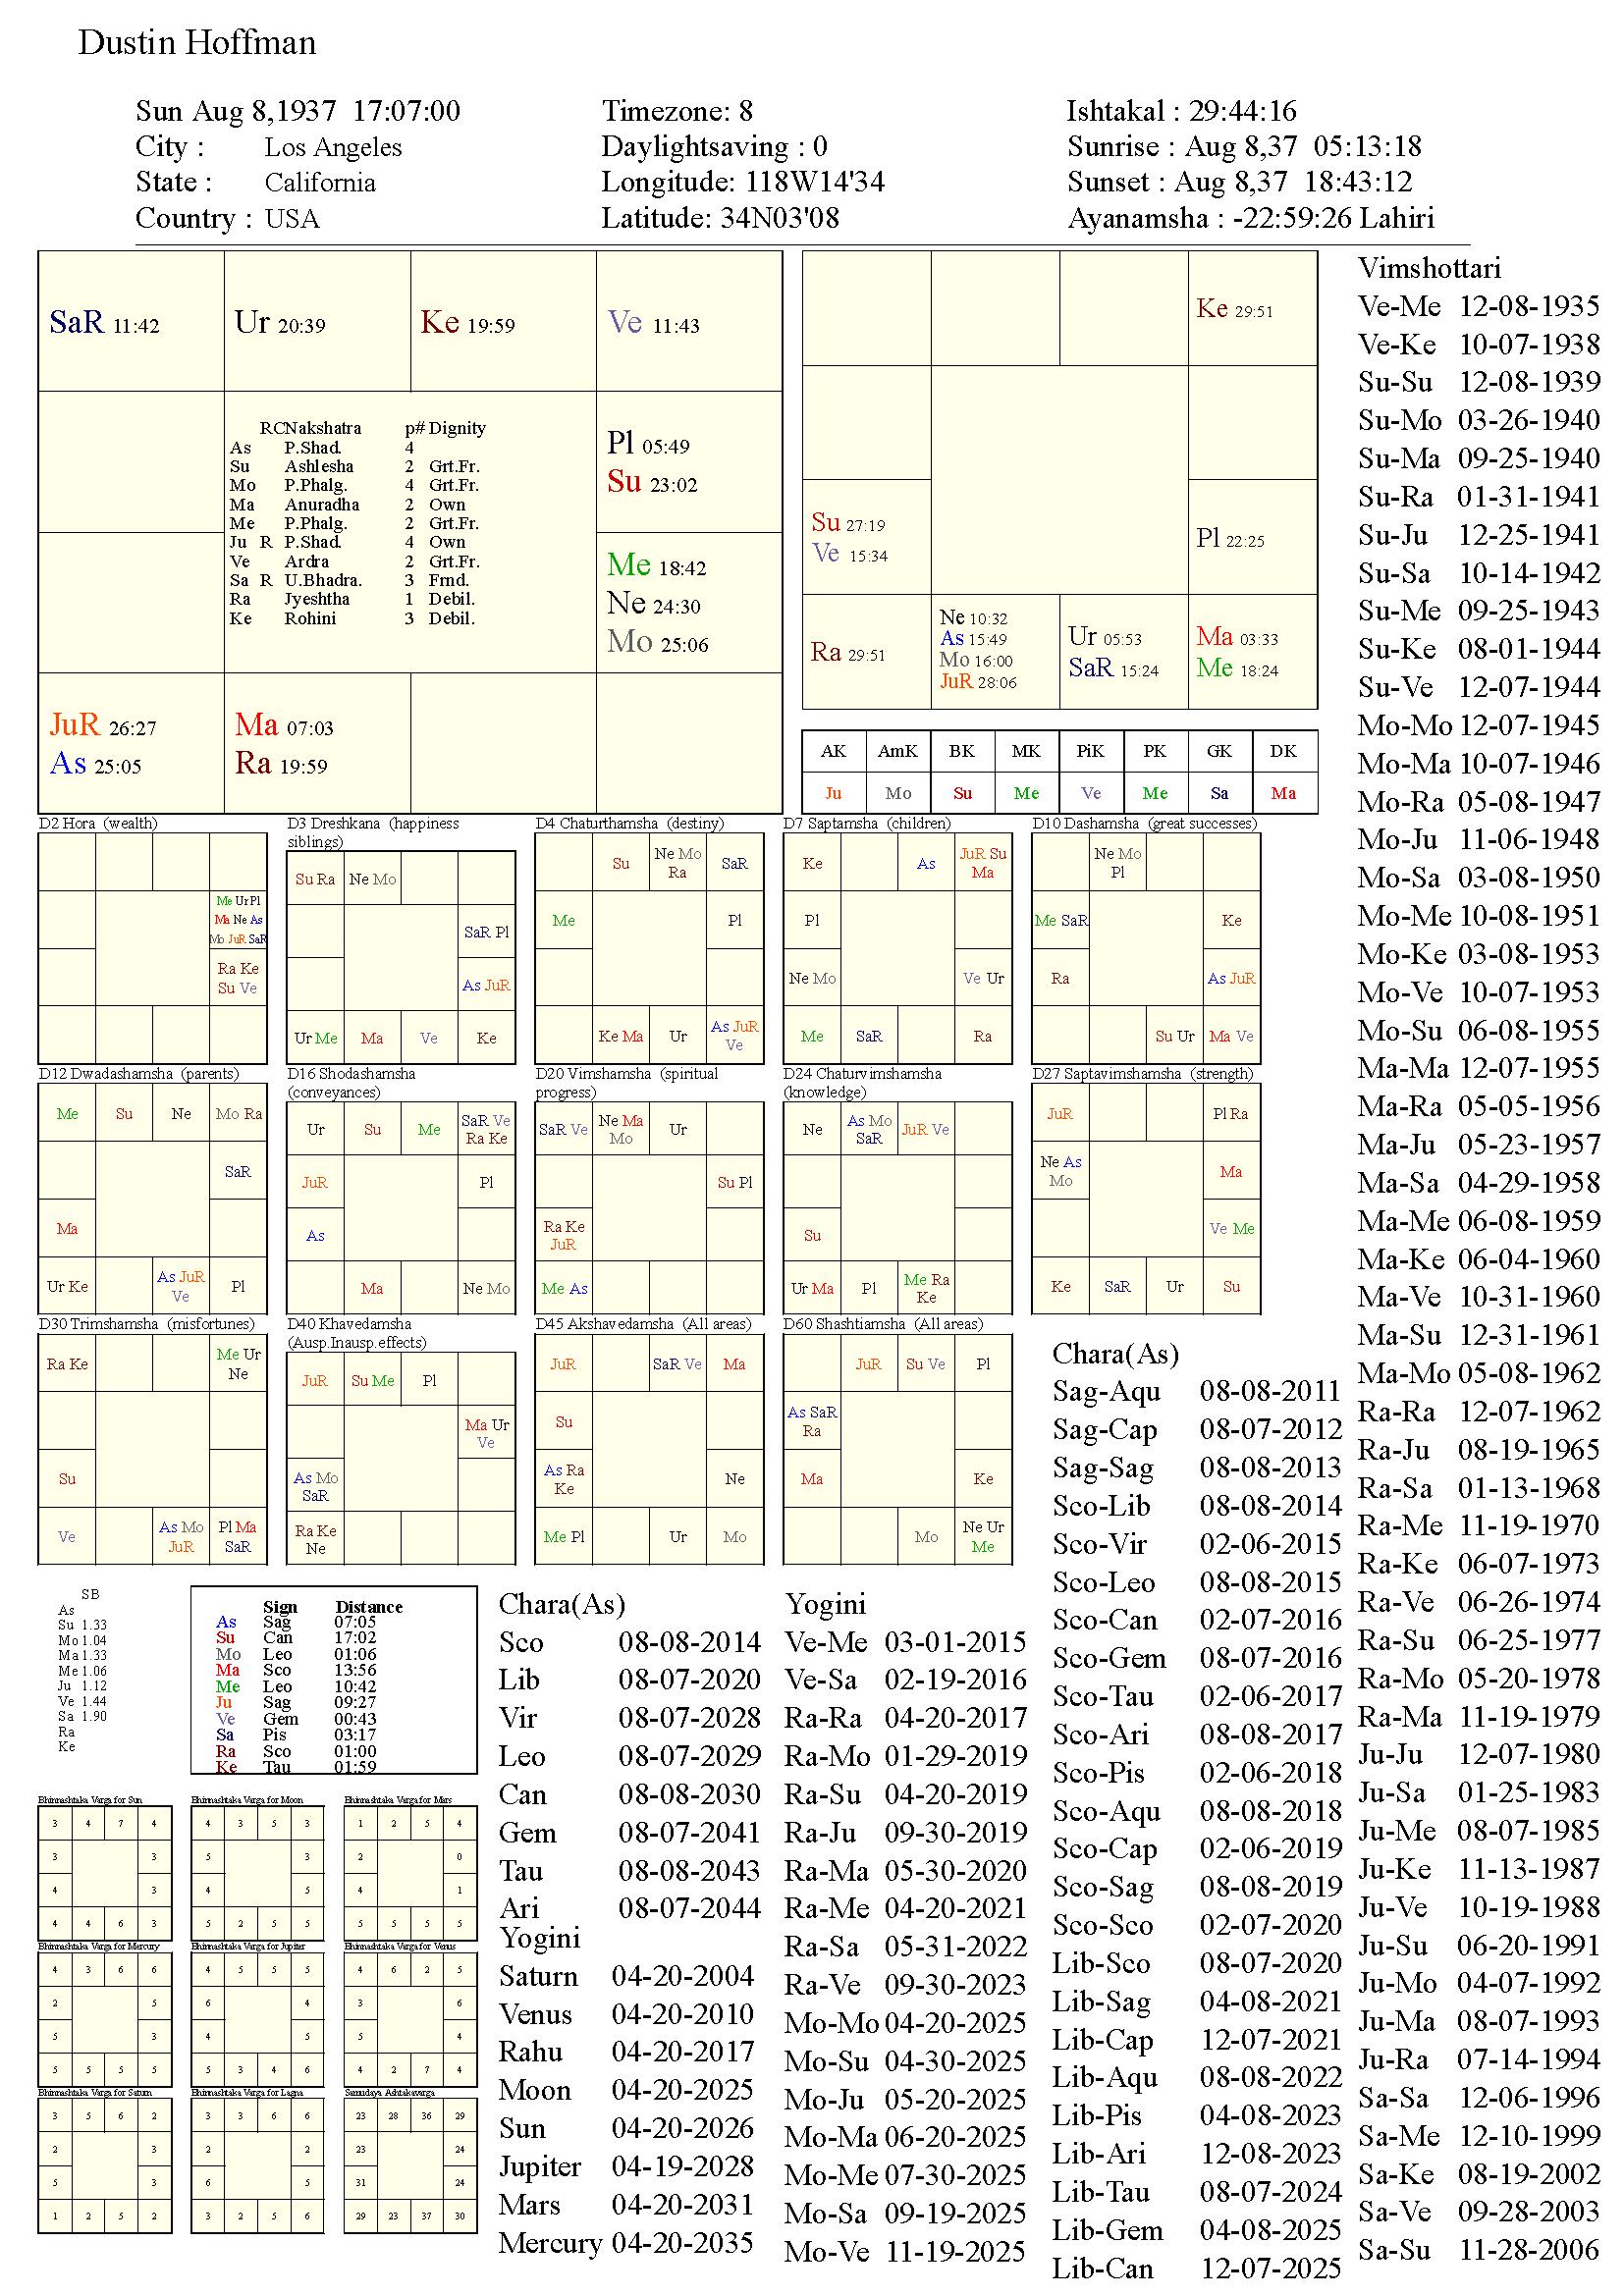 DustinHoffman_chart